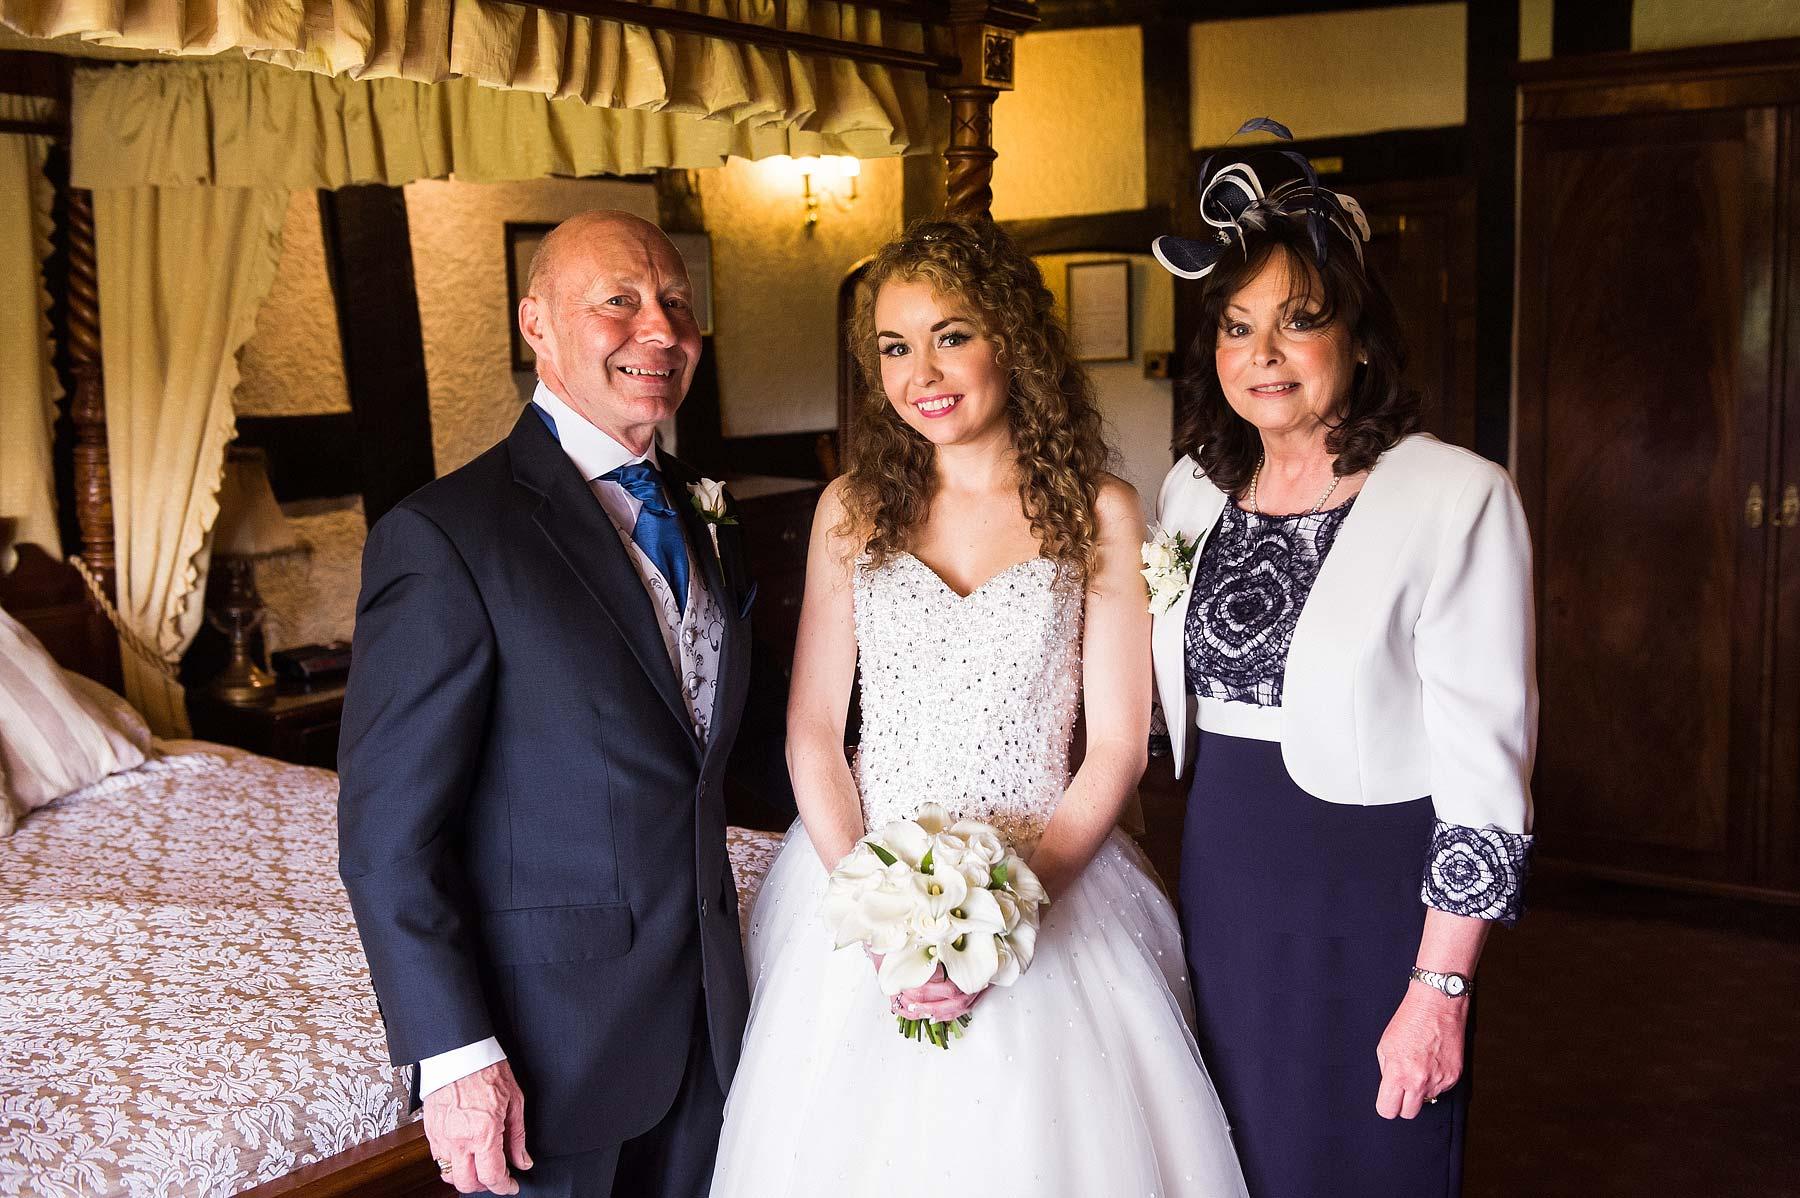 albright-hussey-manor-wedding-photographers-021